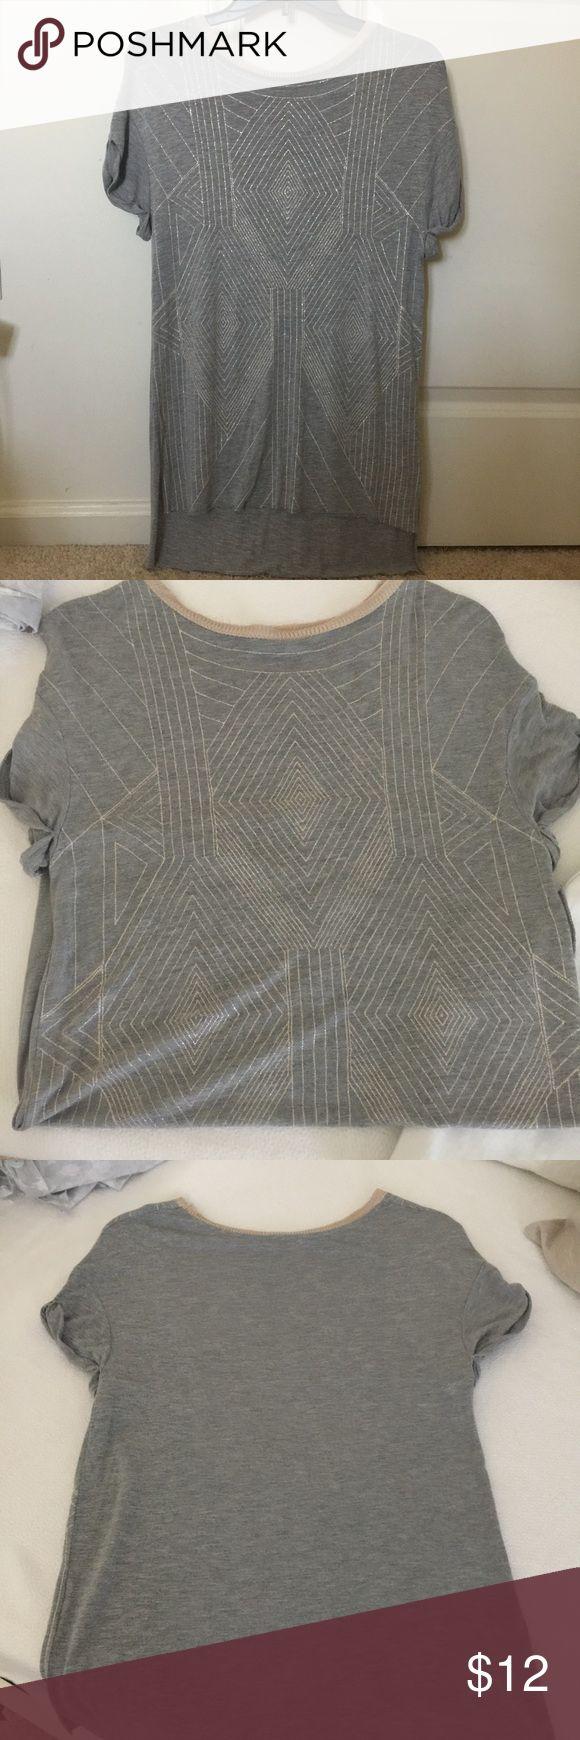 Shiny zara tshirt Beautiful zara tshirt with shiny details. Like new one time used. Zara Tops Tees - Short Sleeve